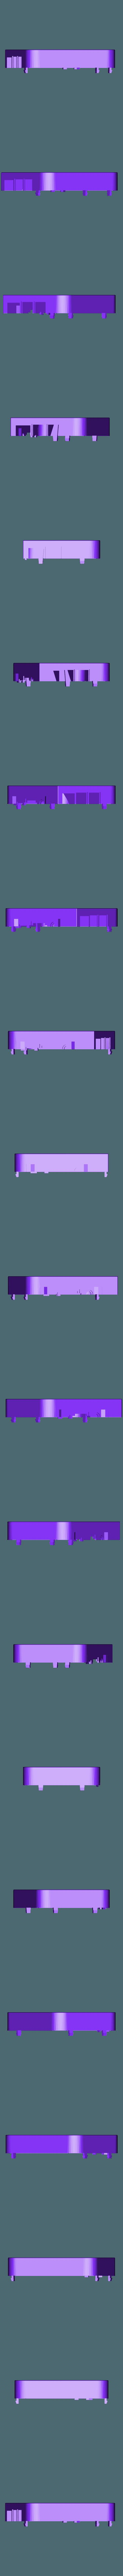 Lead.STL Download free STL file Raspberry Pi 3 B+ enclosure • 3D printable model, kgitman